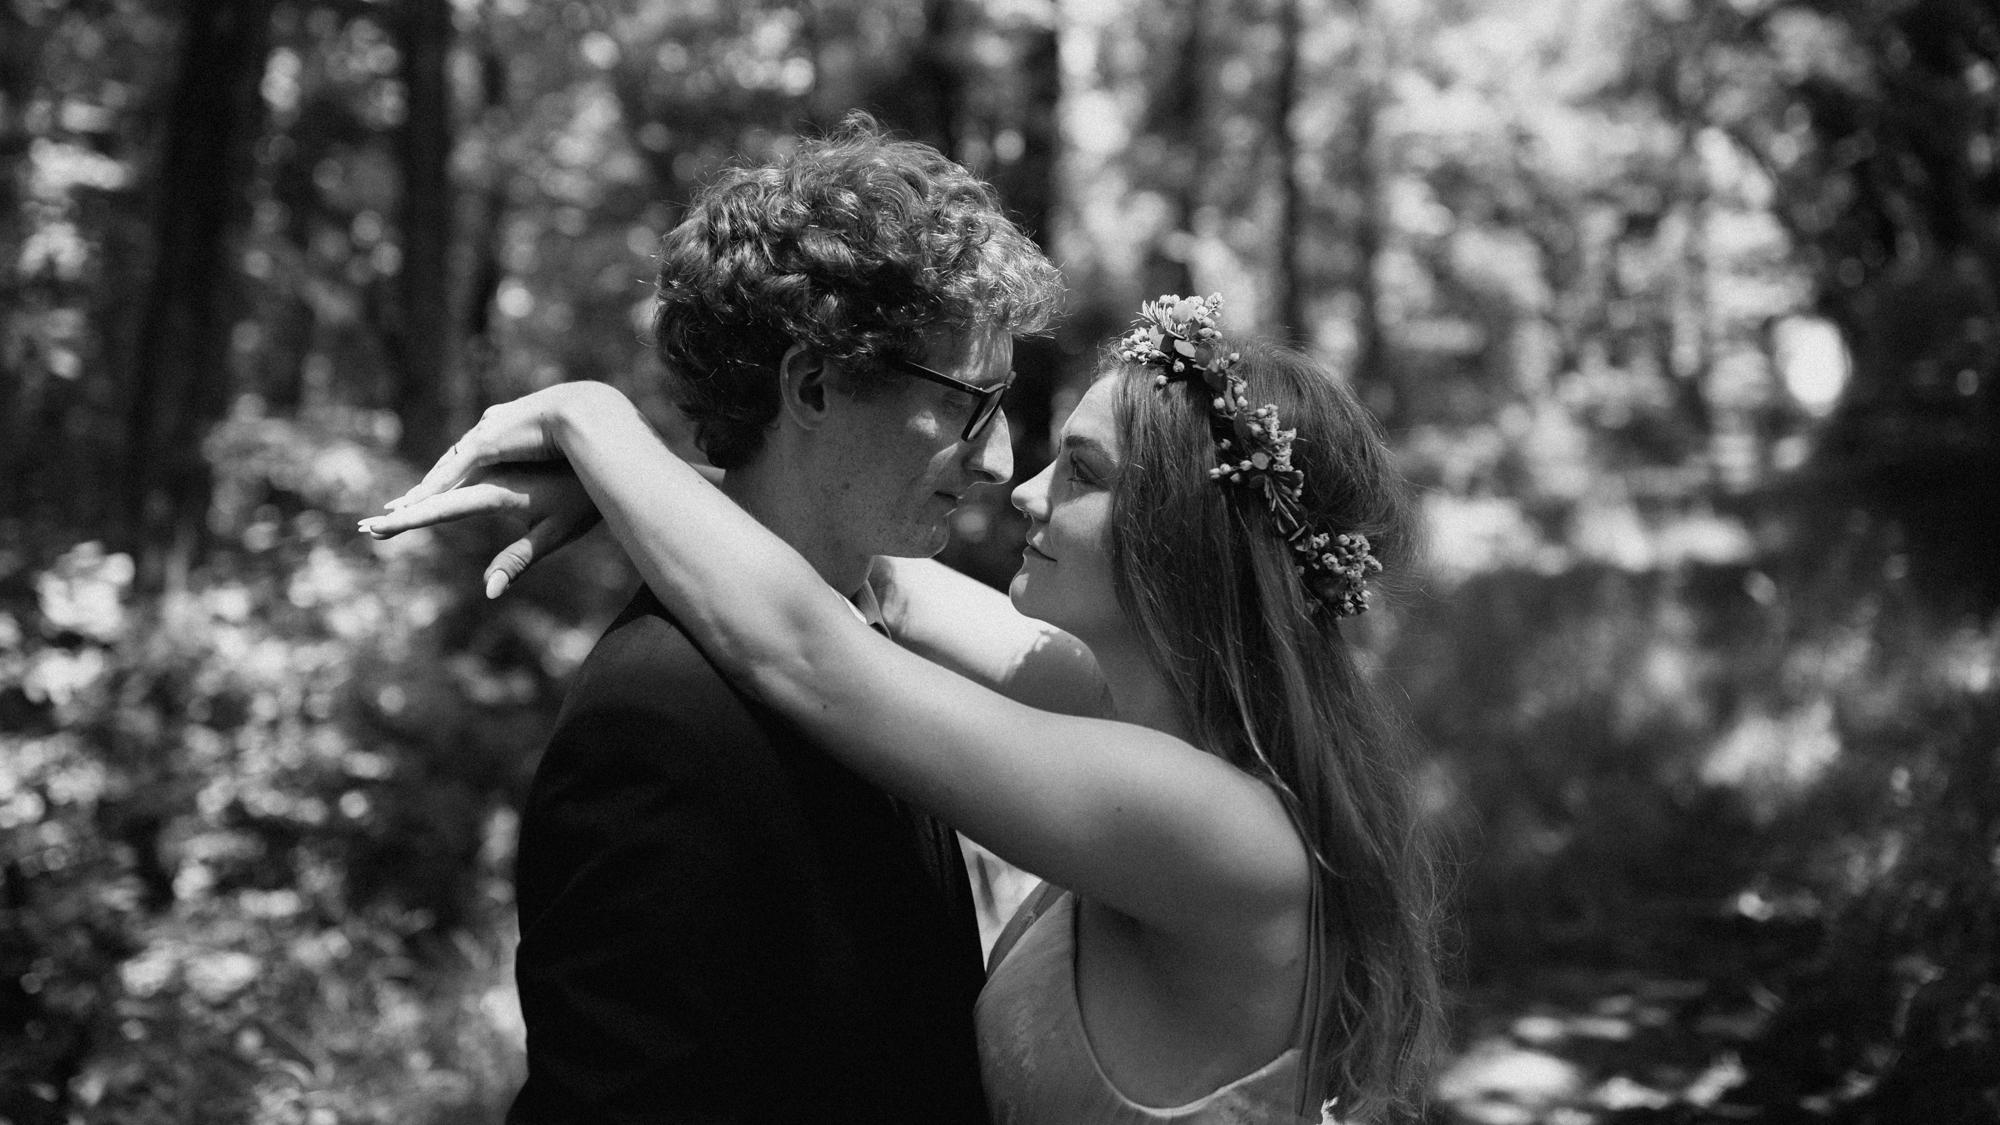 alec_vanderboom_kansas_city_mo_wedding_photos-0091.jpg